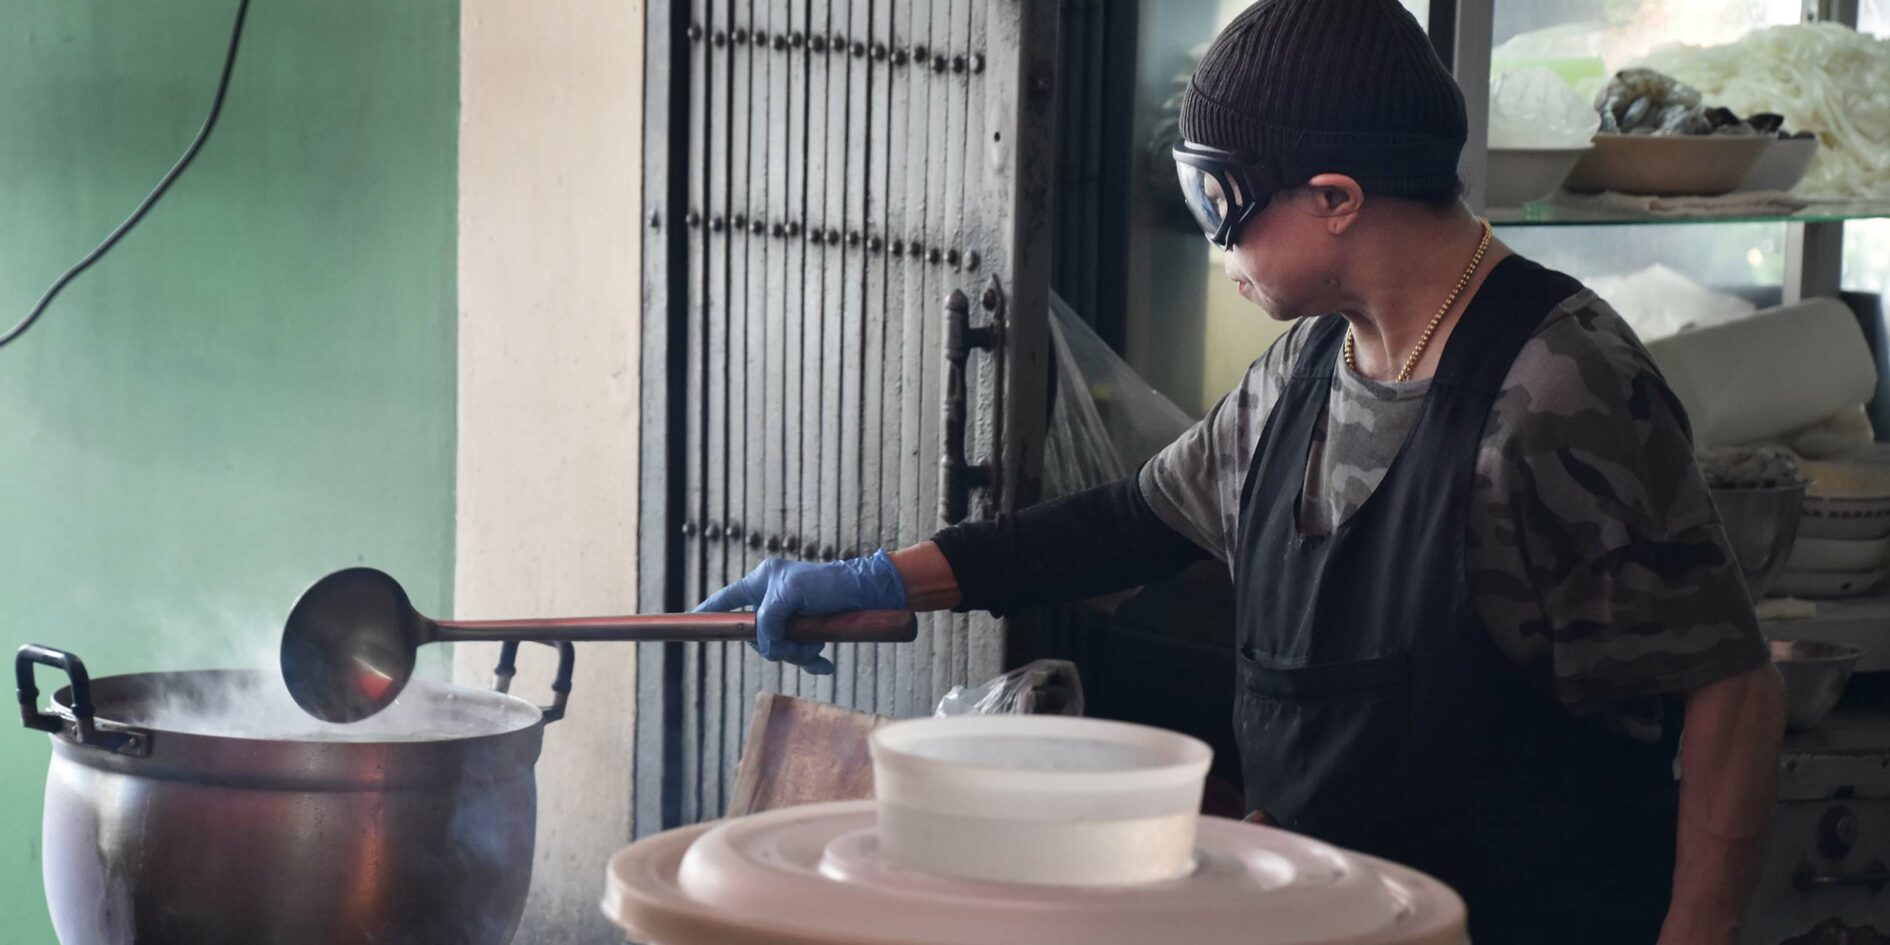 JAY FAI: BANGKOK'S STREET-SIDE MICHELIN STAR IN THE AGE OF COVID